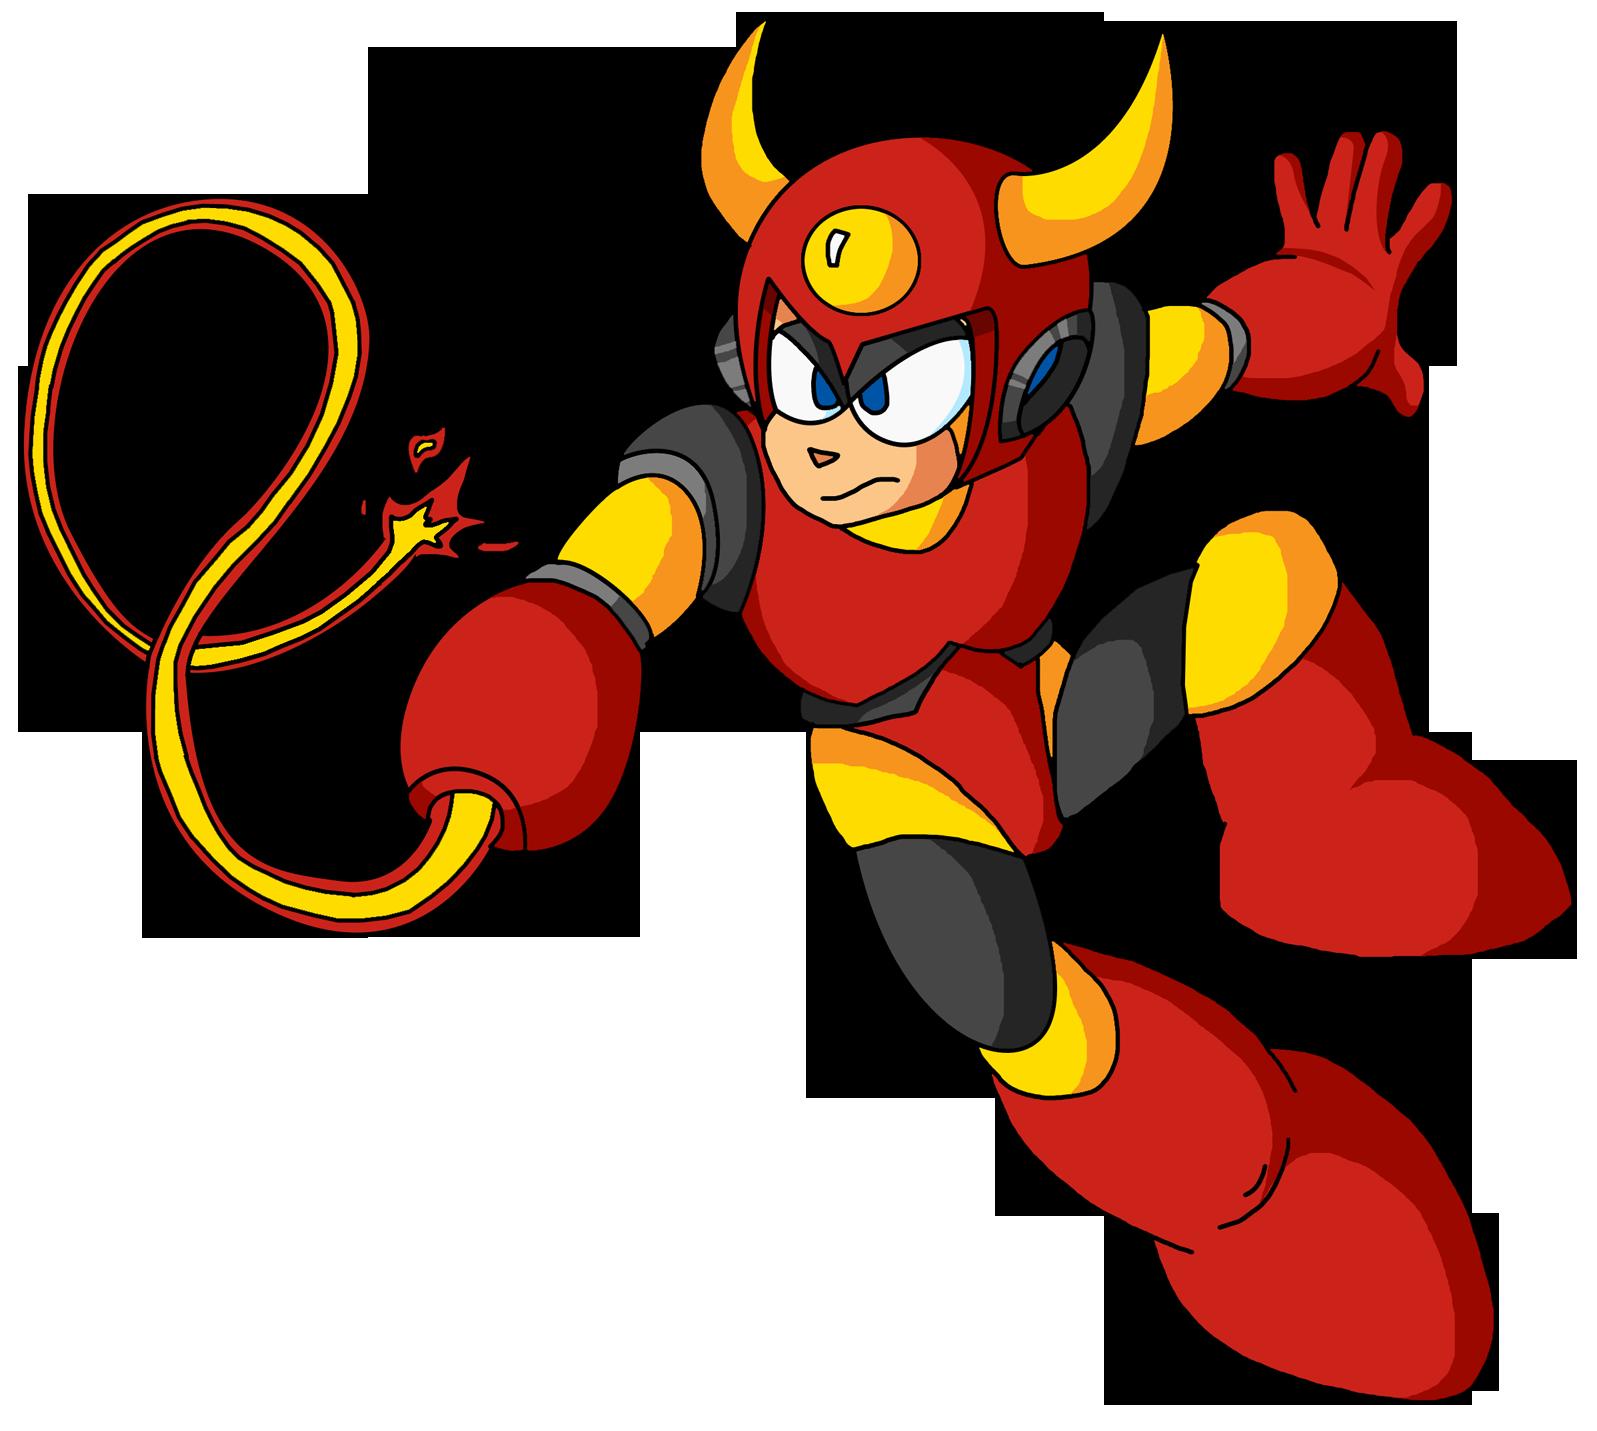 Devil clipart logo. Free man cliparts download